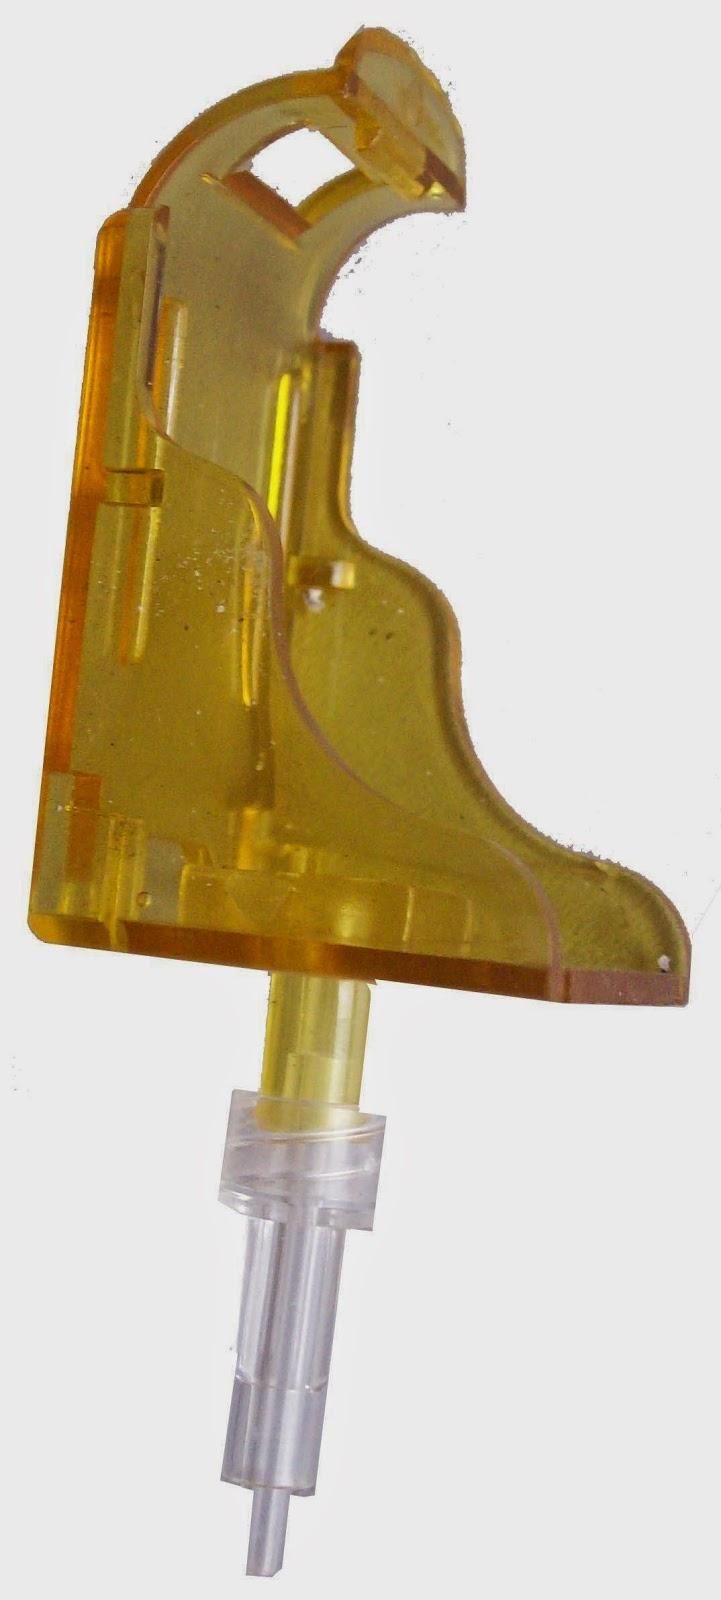 POLAR IRDA USB DRIVER